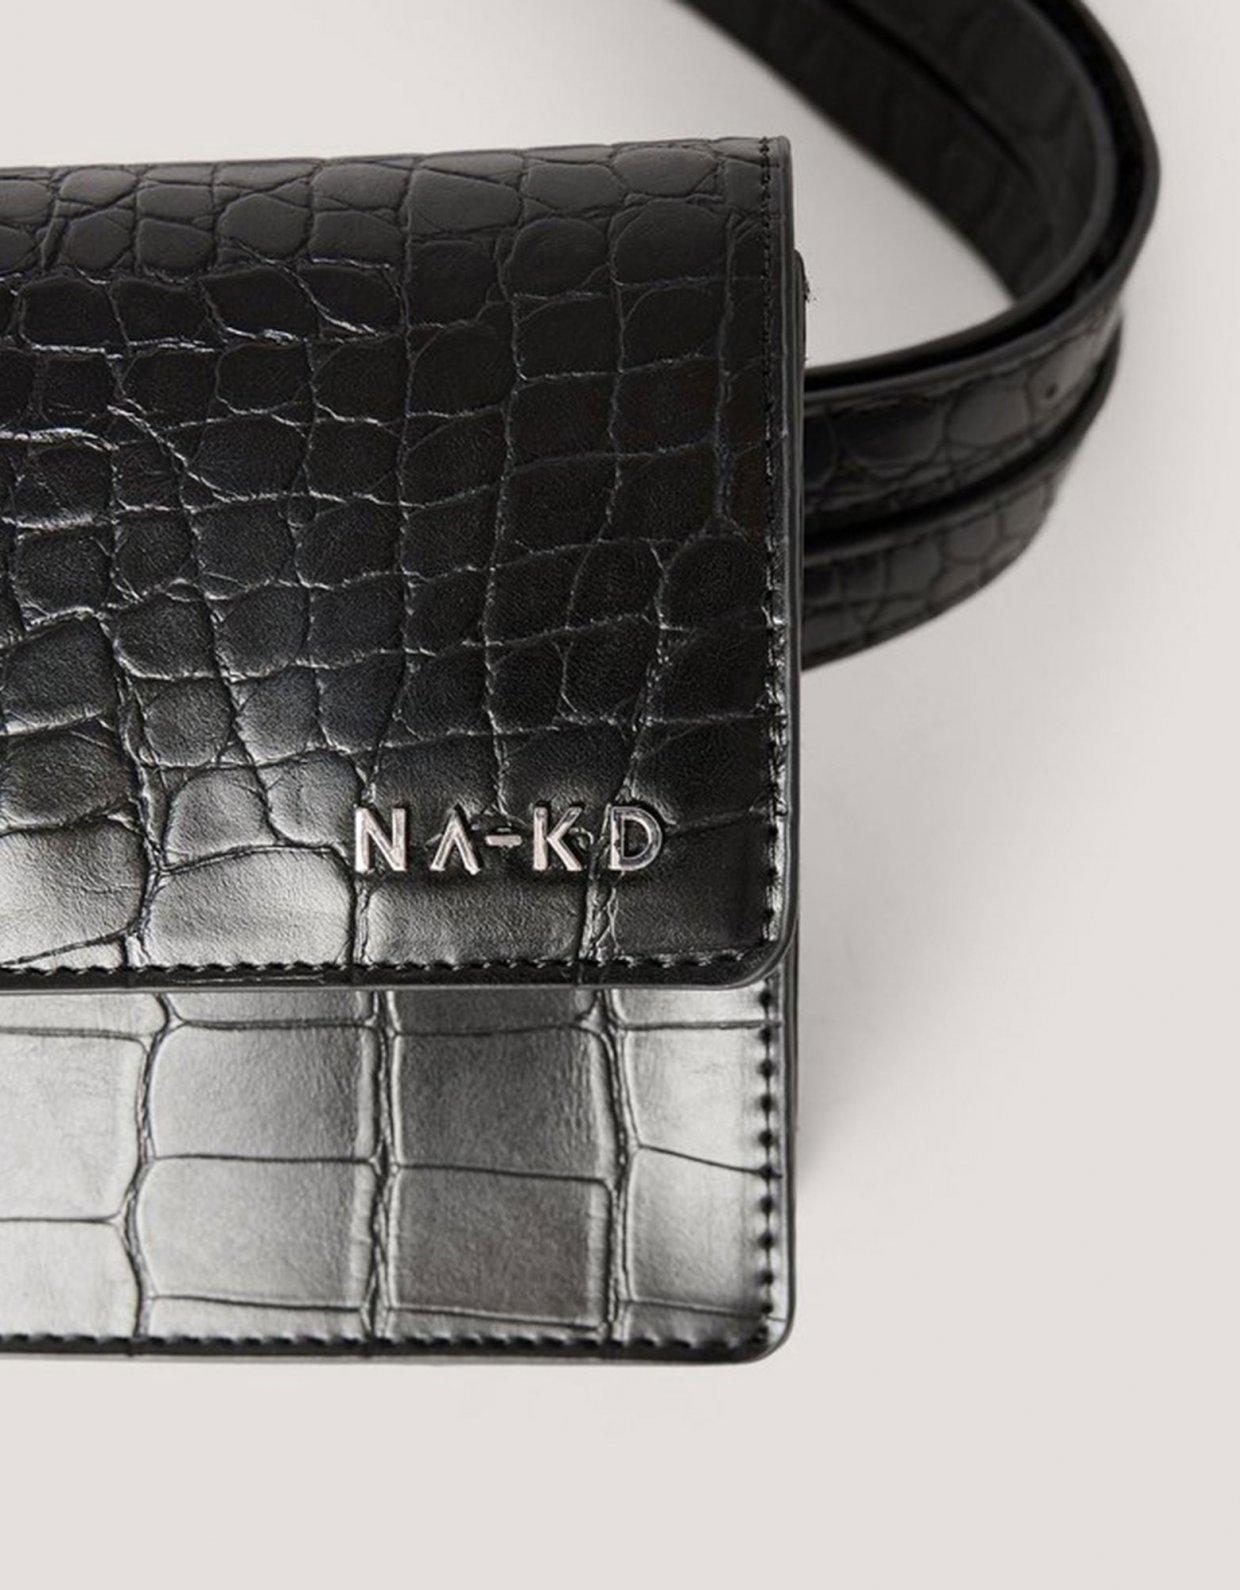 NA-KD Mini fanny pack black